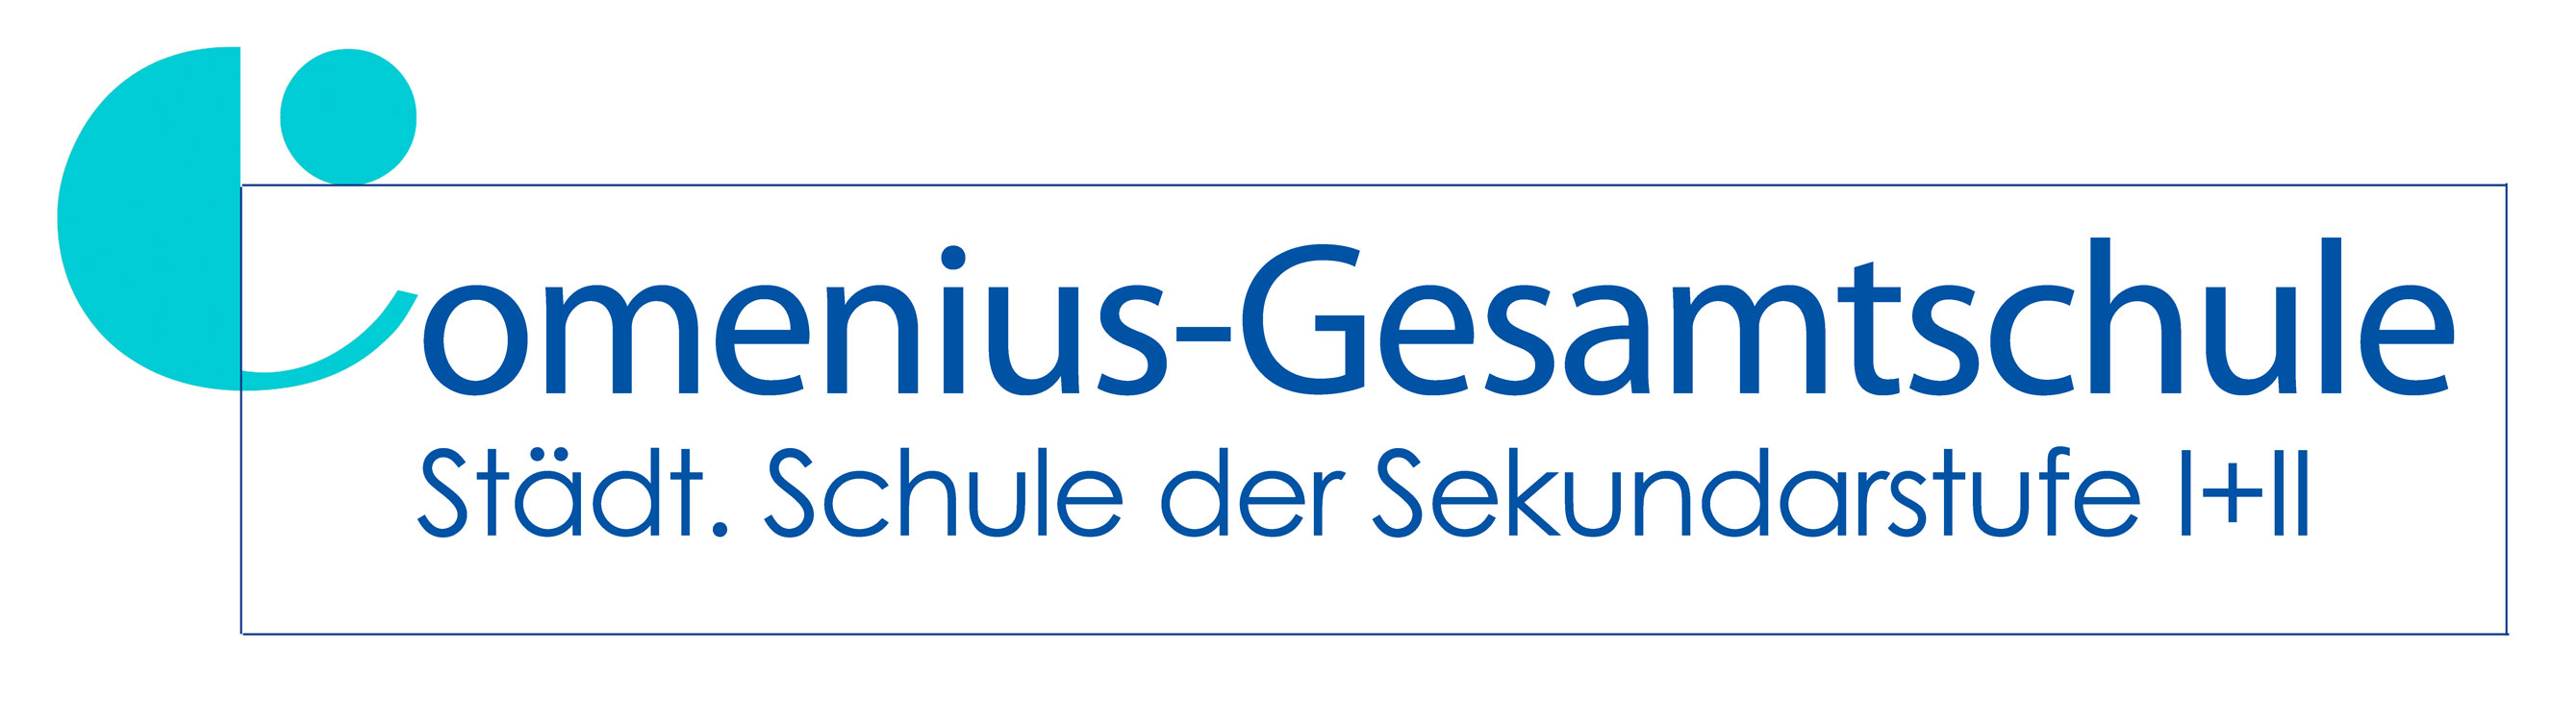 Comenius-Gesamschule Neuss